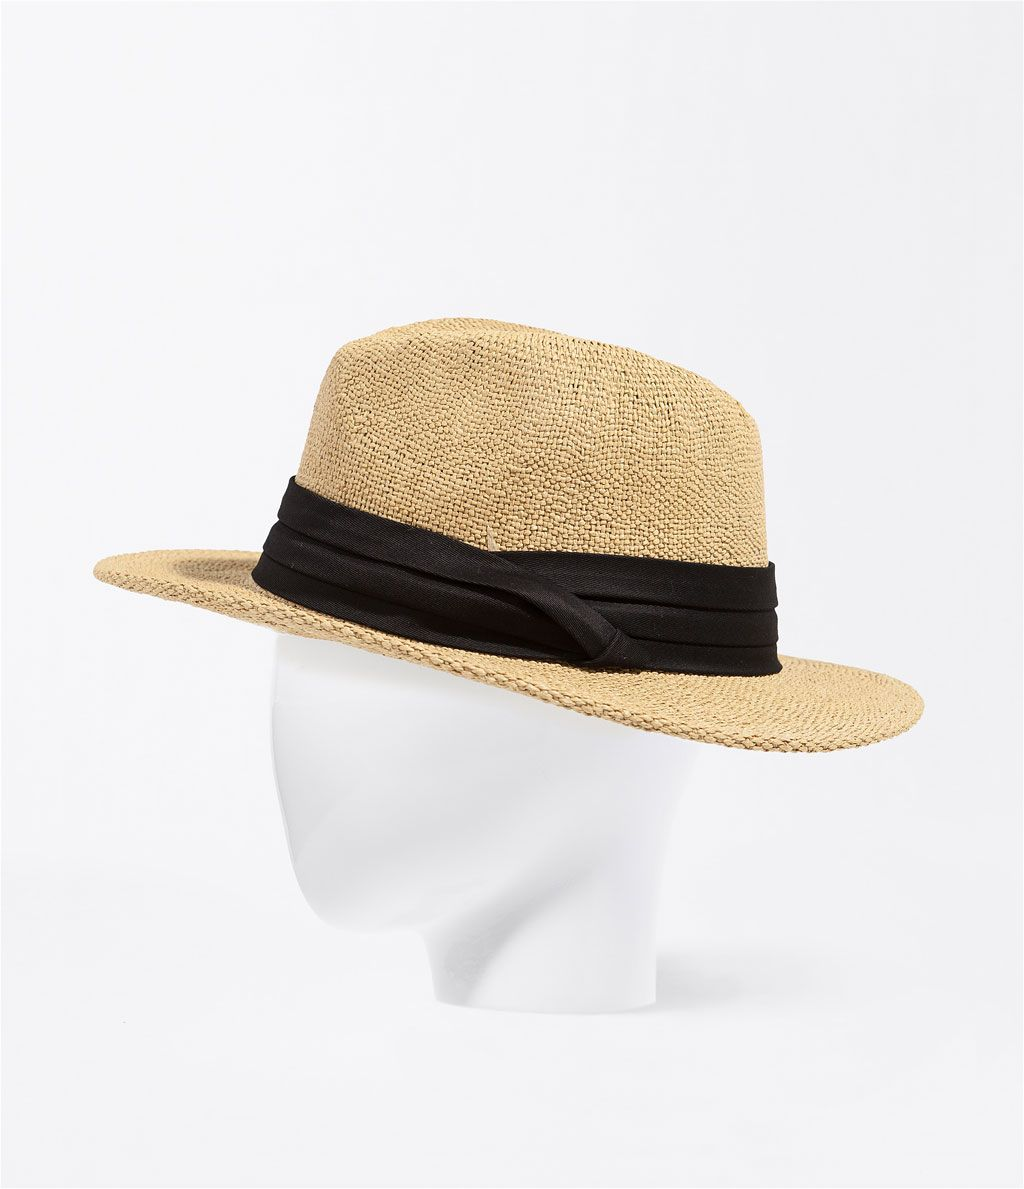 7b08fbb97e58d  paja  sombrero  playa  Zara Lamey Home 19